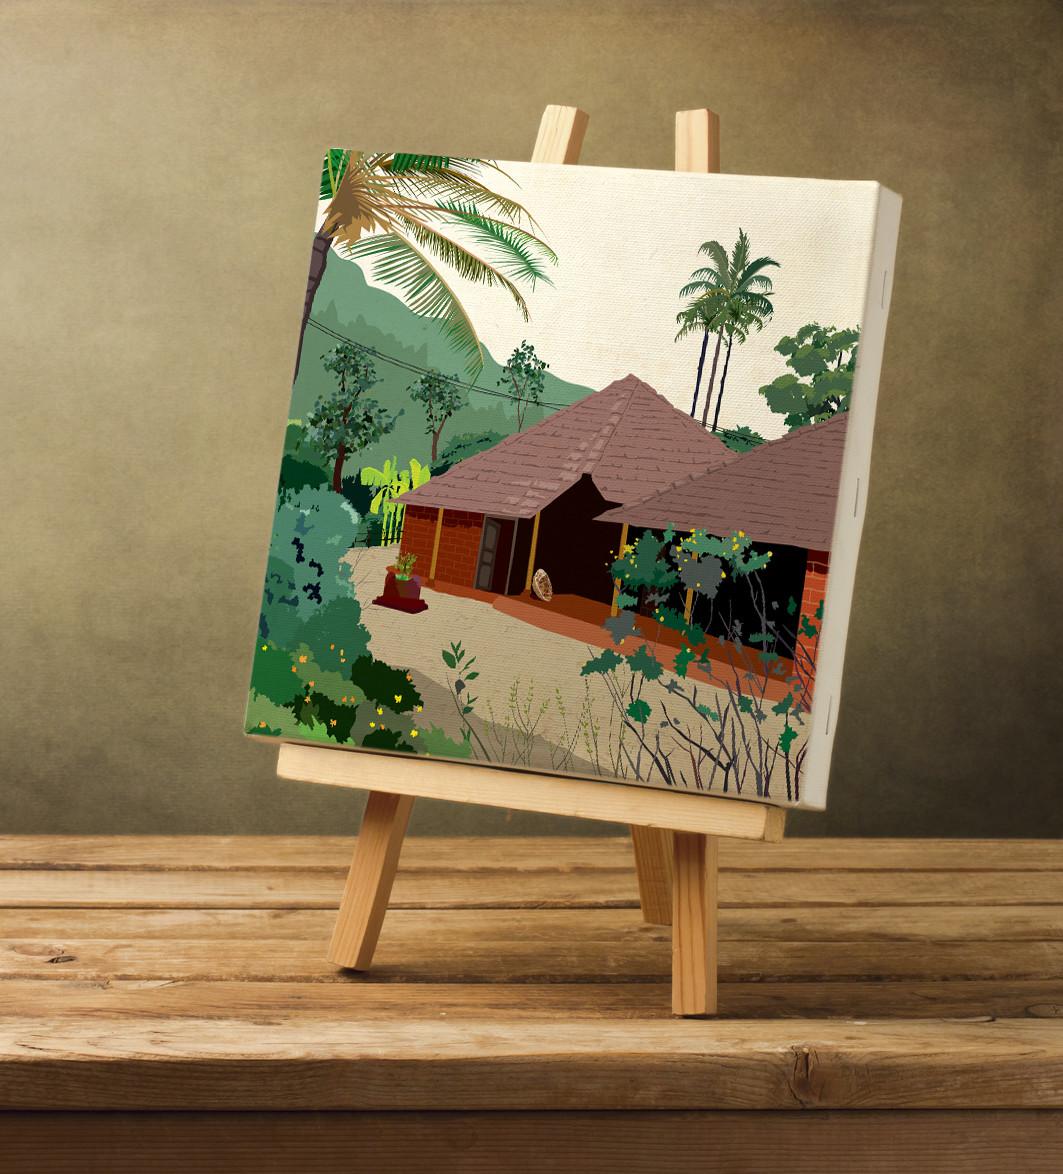 Rajesh r sawant blank canvas konkan house crop